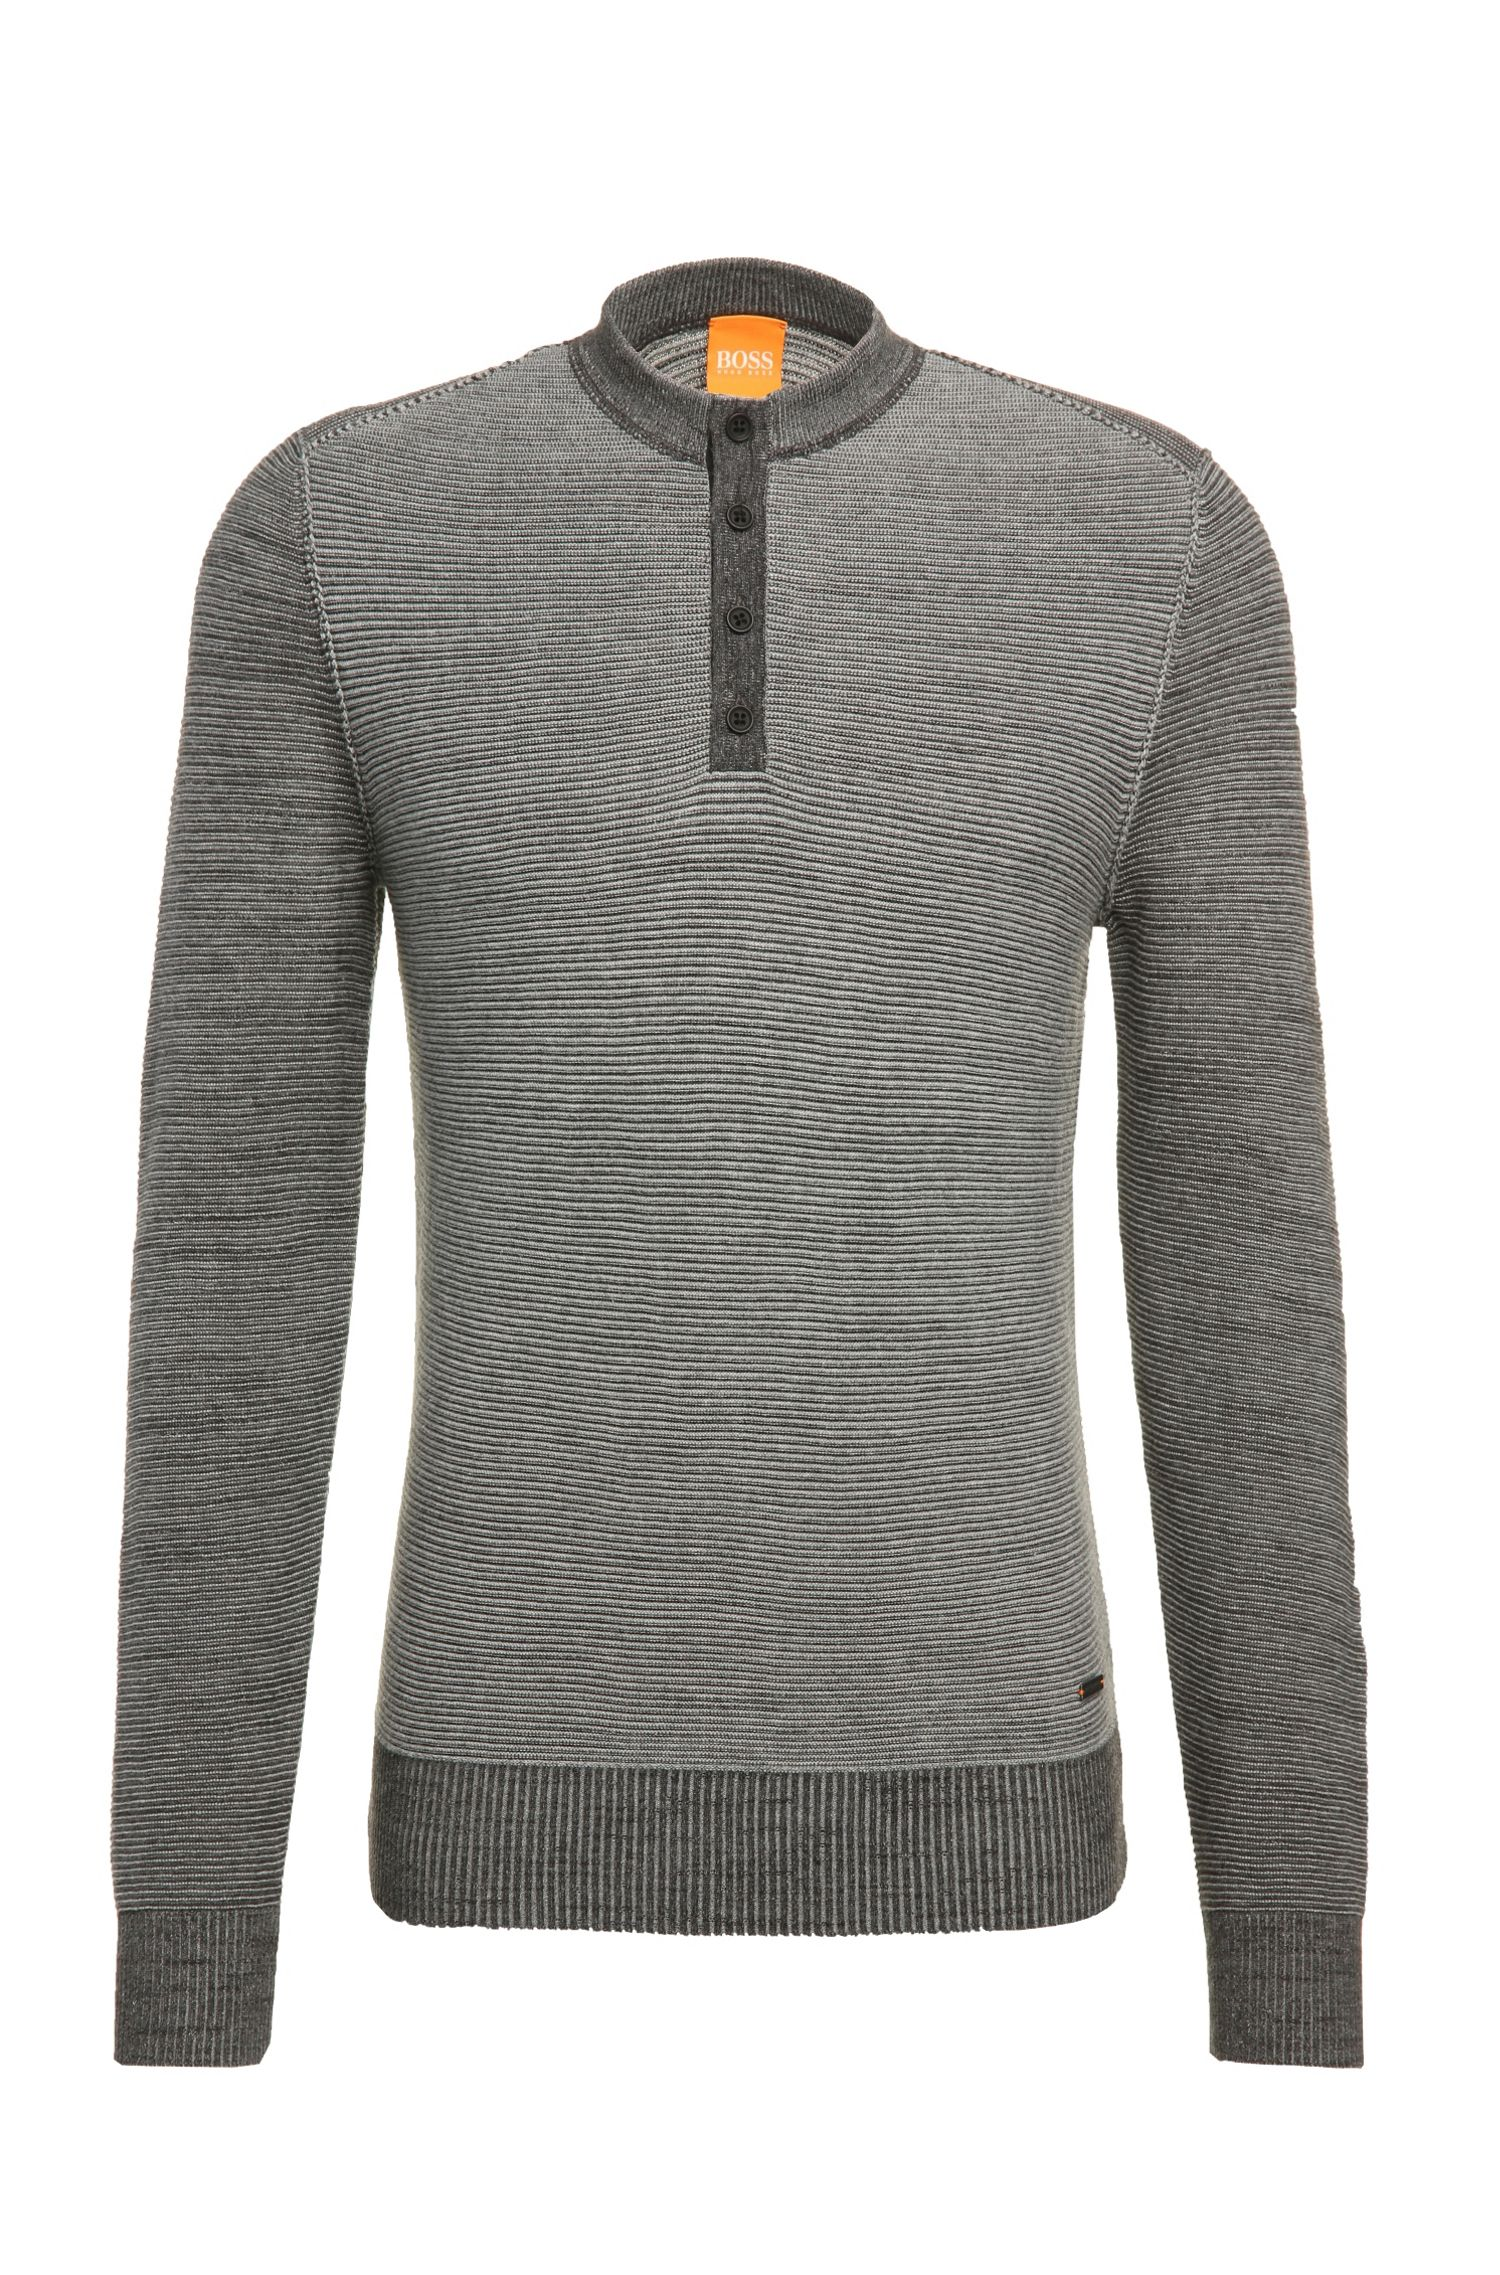 'Kenhenry' | Cotton Henley Sweater